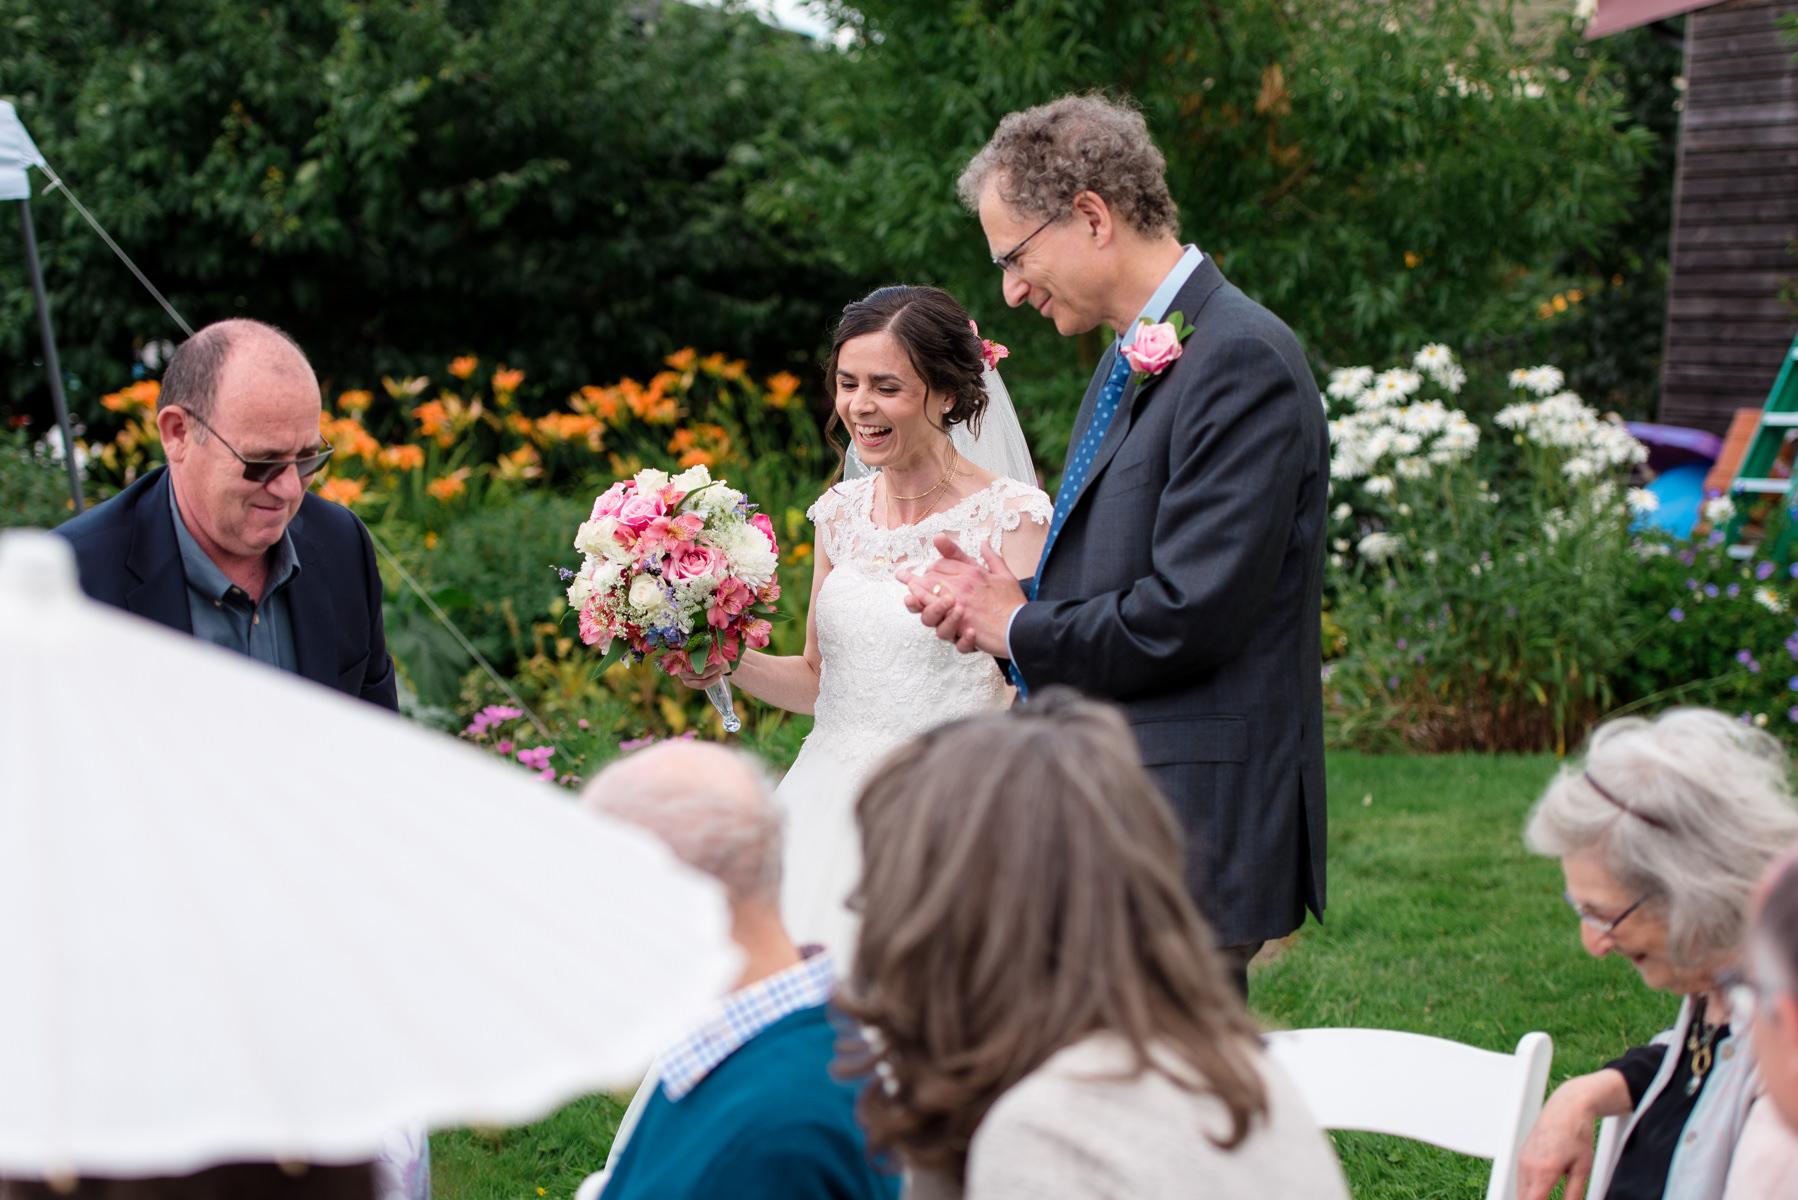 Andrew Tat - Documentary Wedding Photography - Kirkland, Washington - Emily & Cuauh - 07.JPG